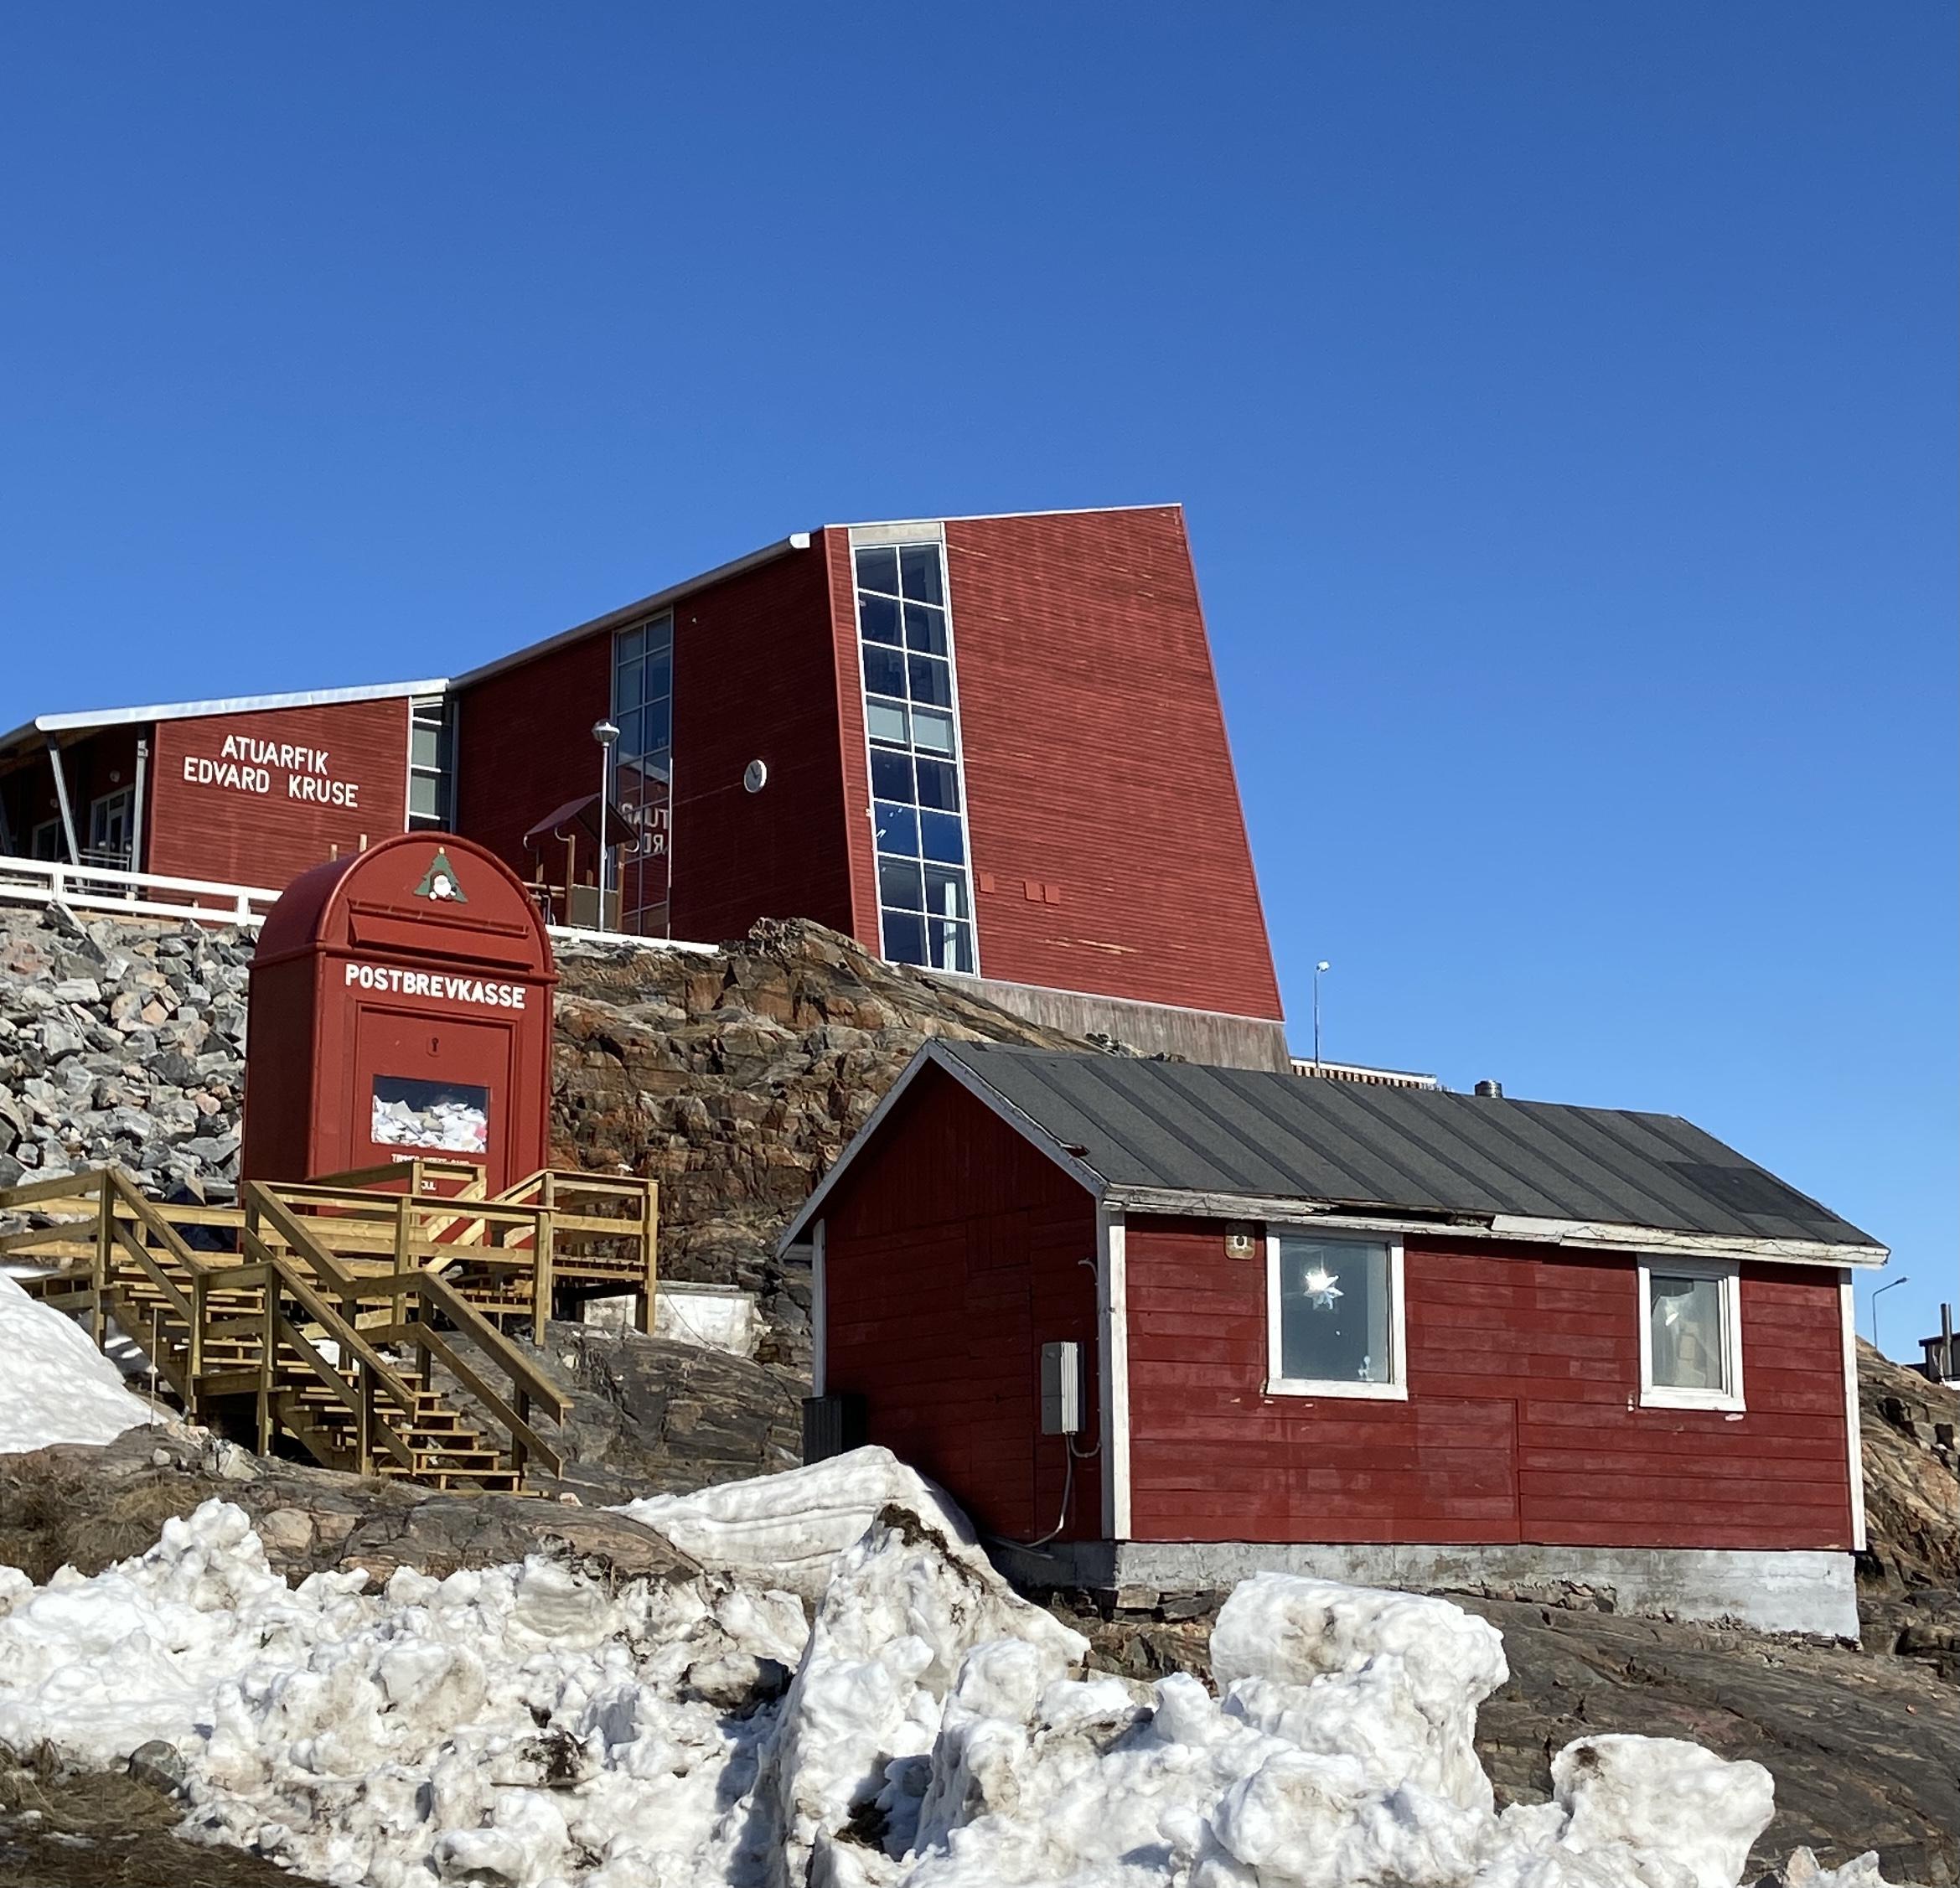 Julemandens kæmpestore postkasse i Uummannaq Centrum. Tømmes én gang om året.